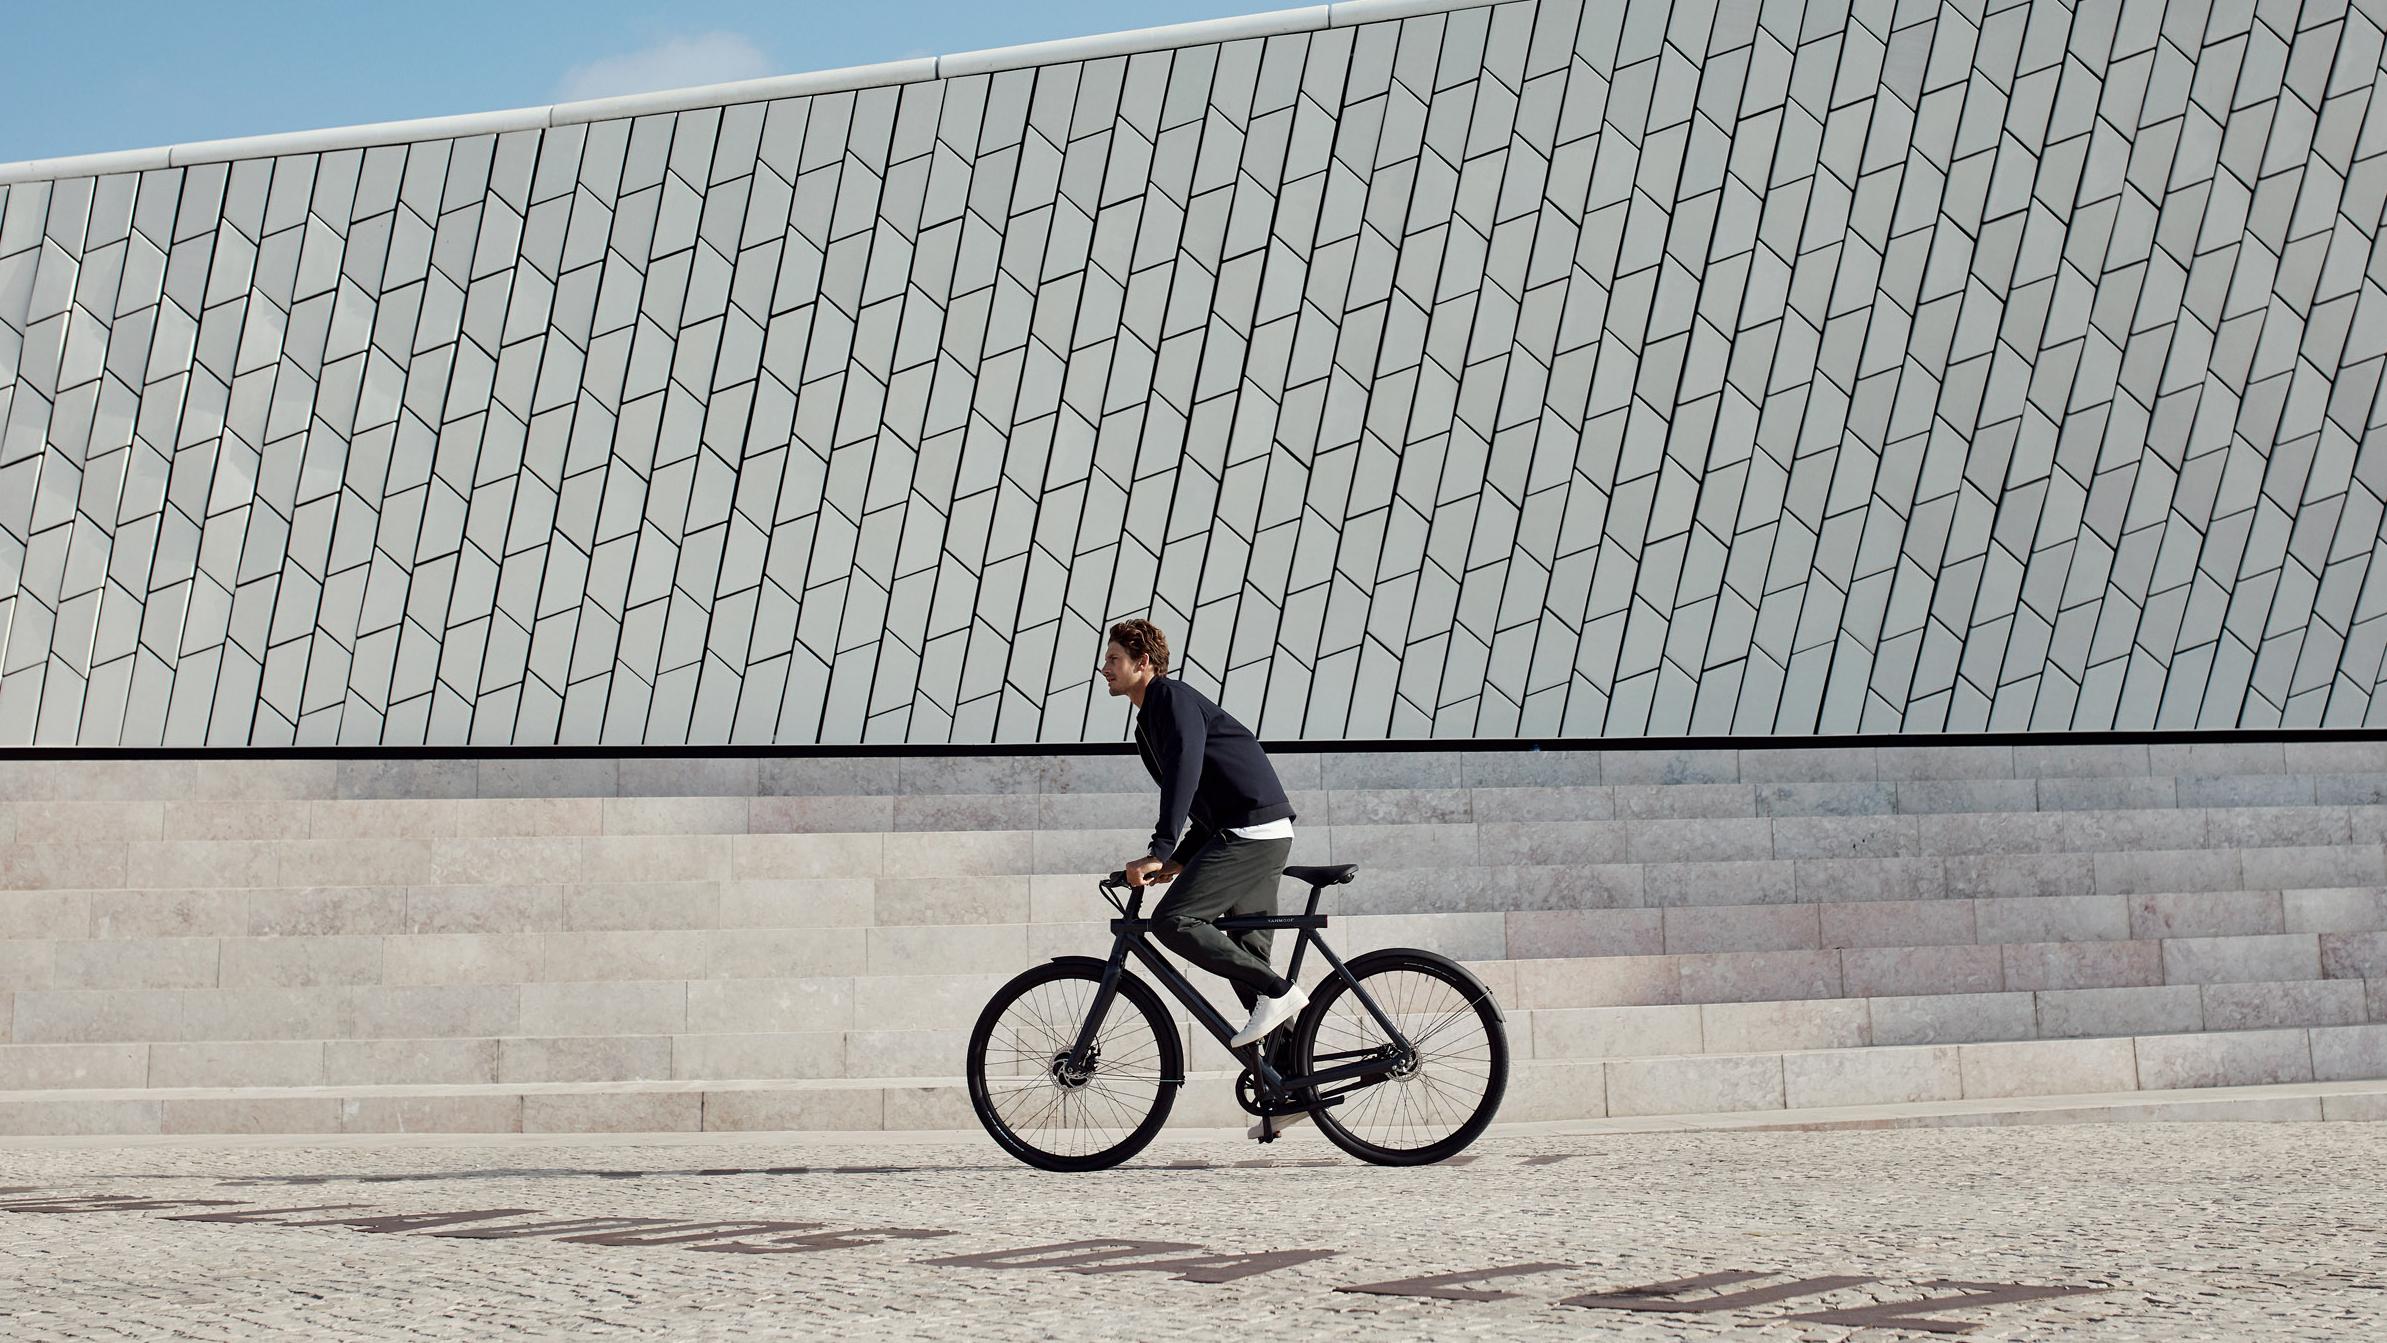 Tokyo bike review uk dating